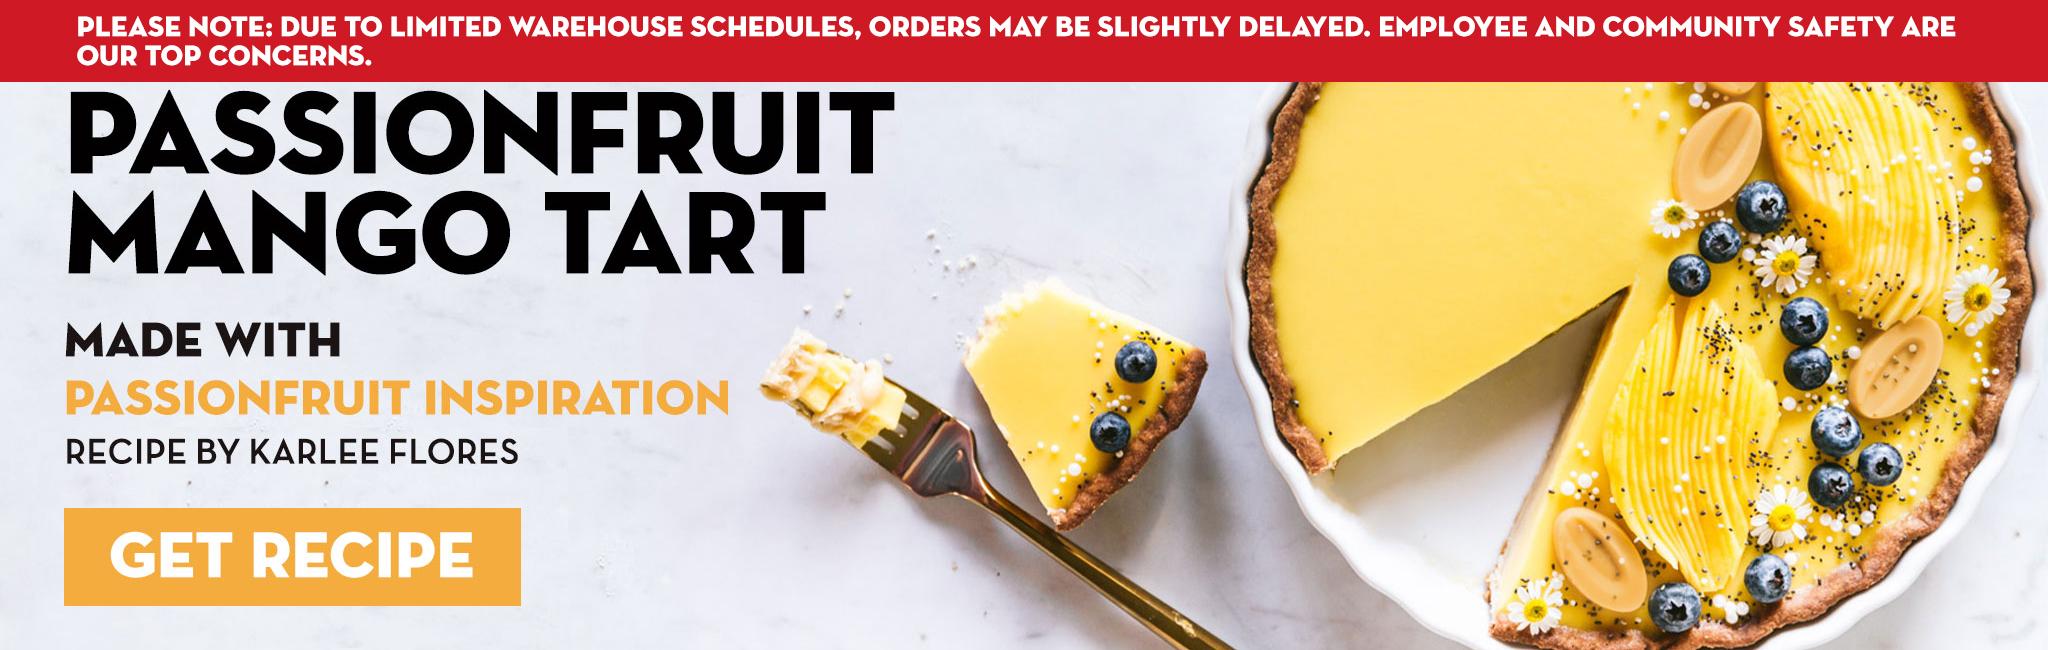 Passion fruit mango tart recipe